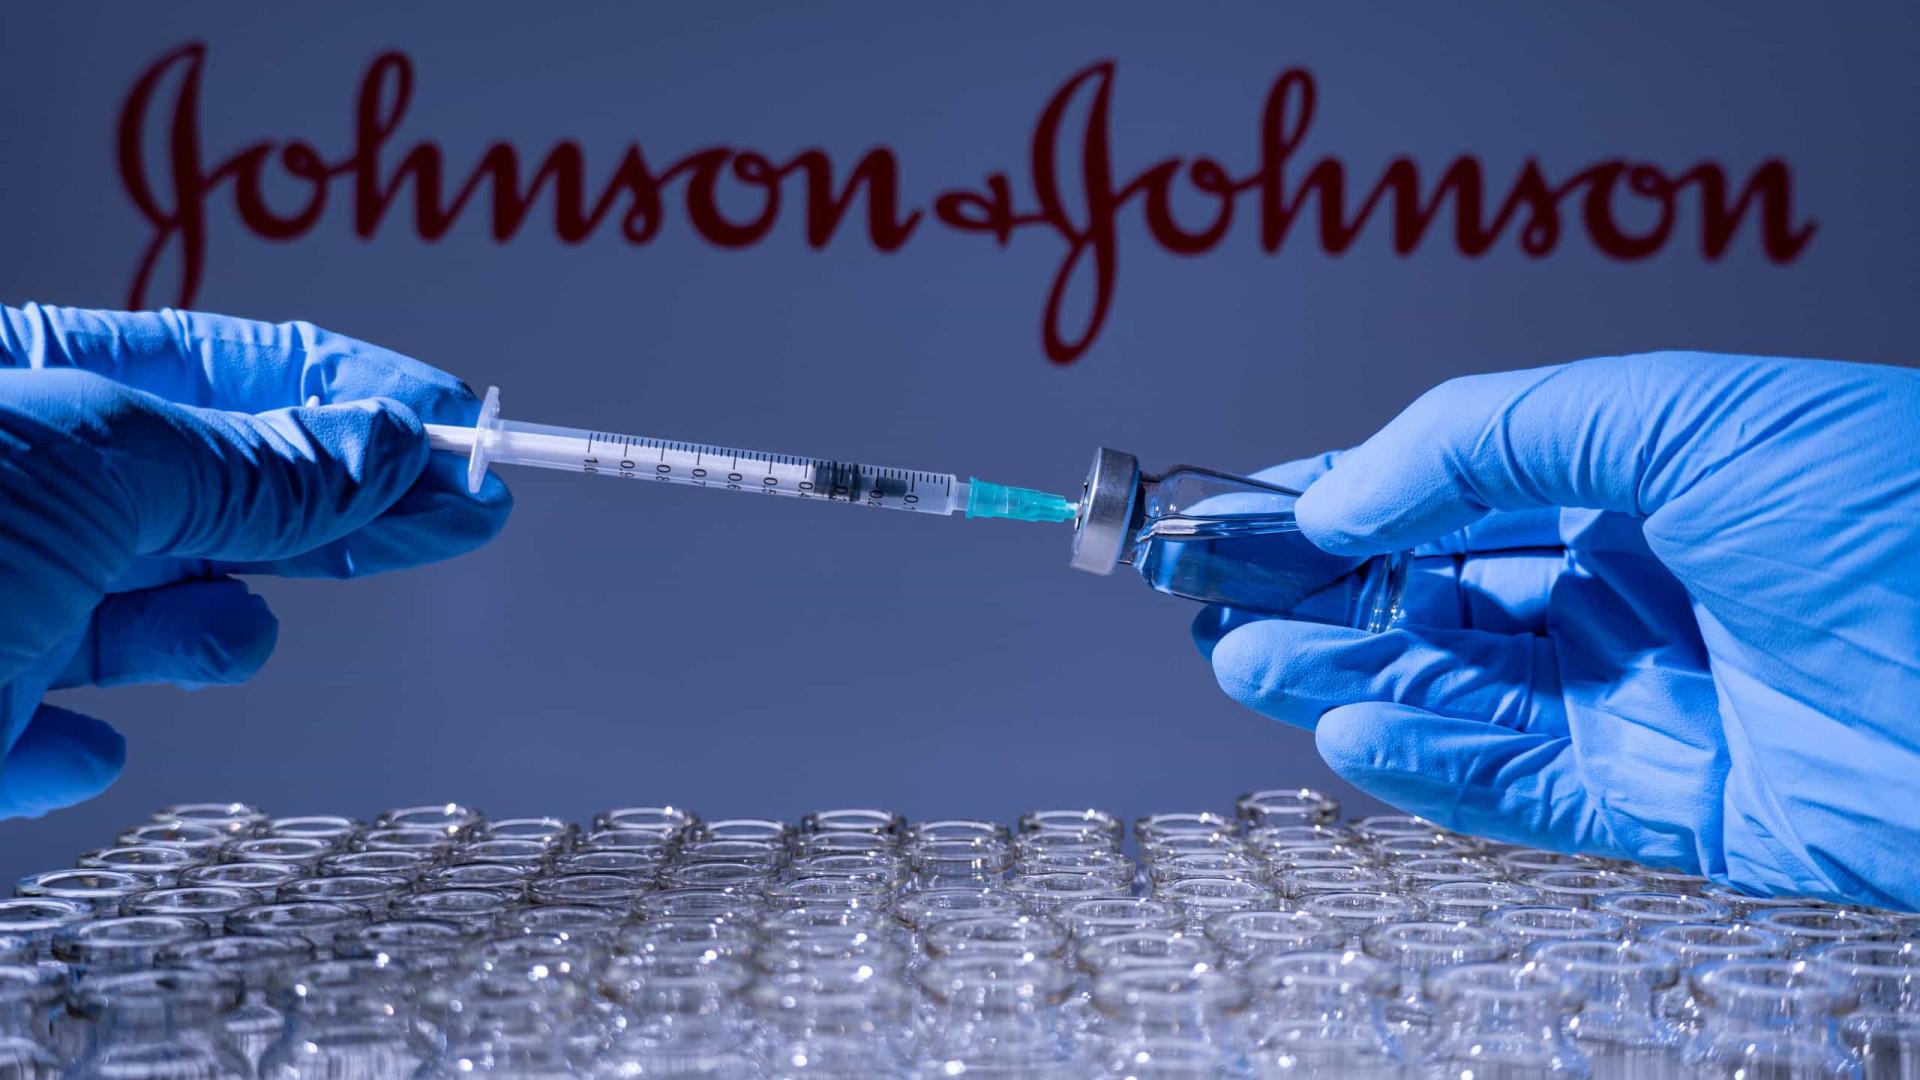 Entrega de vacinas Johnson & Johnson nos EUA diminuirá drasticamente